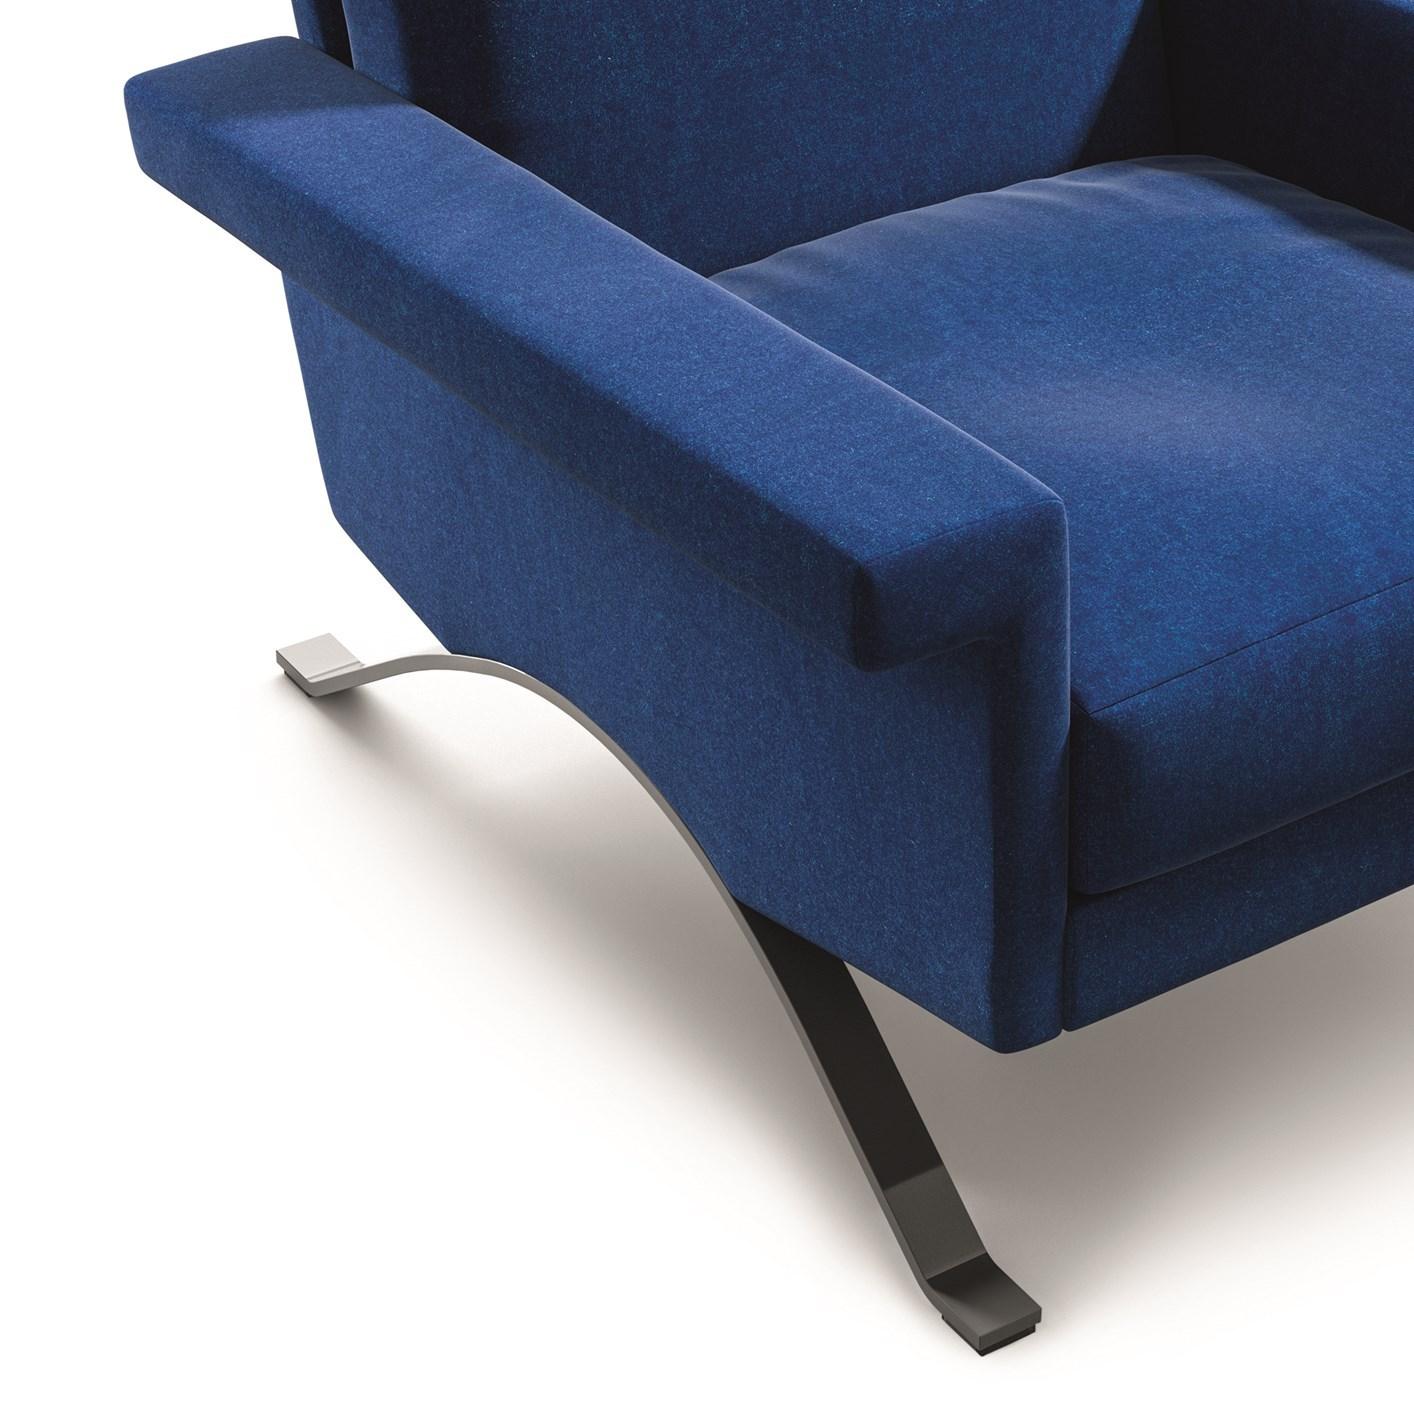 875 armchair por Ico Parisi 02